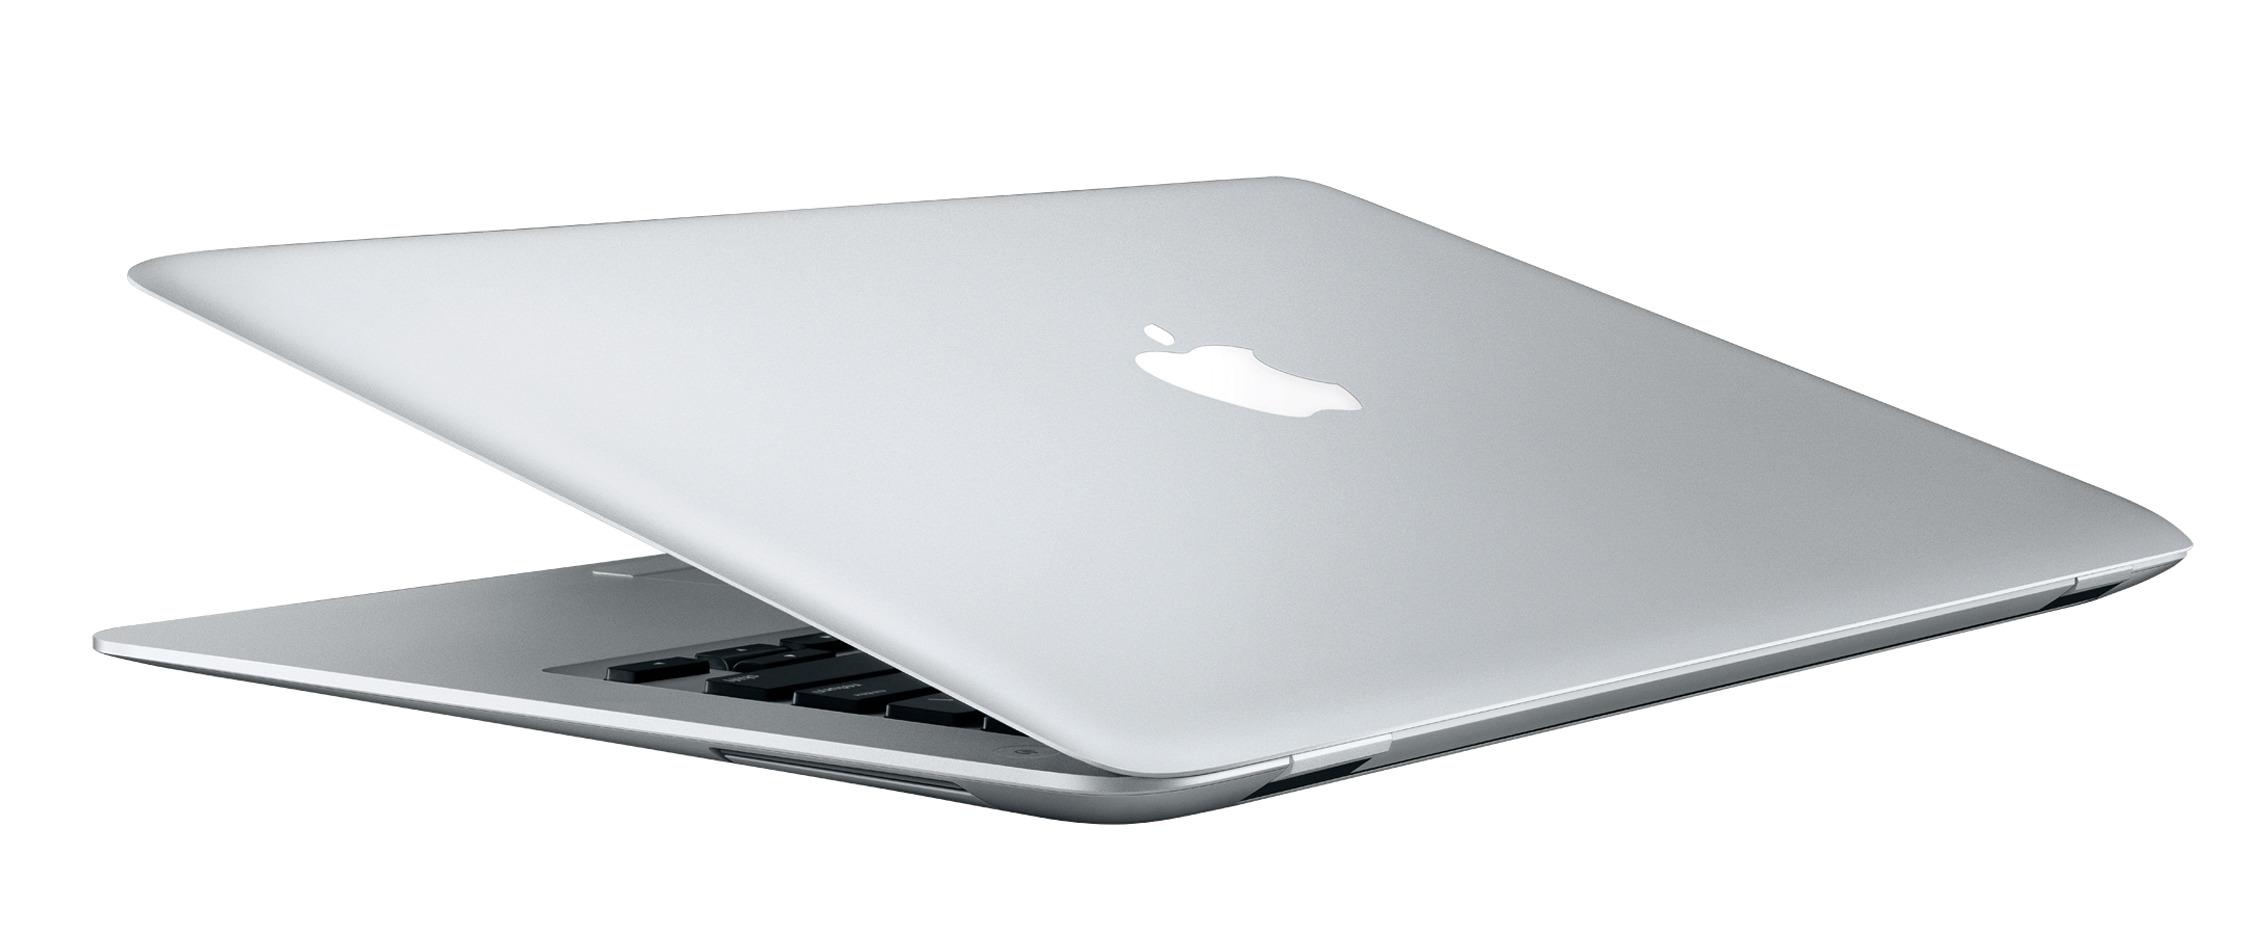 Mac Ssd Performance And Trim In Osx Bit Tech Net